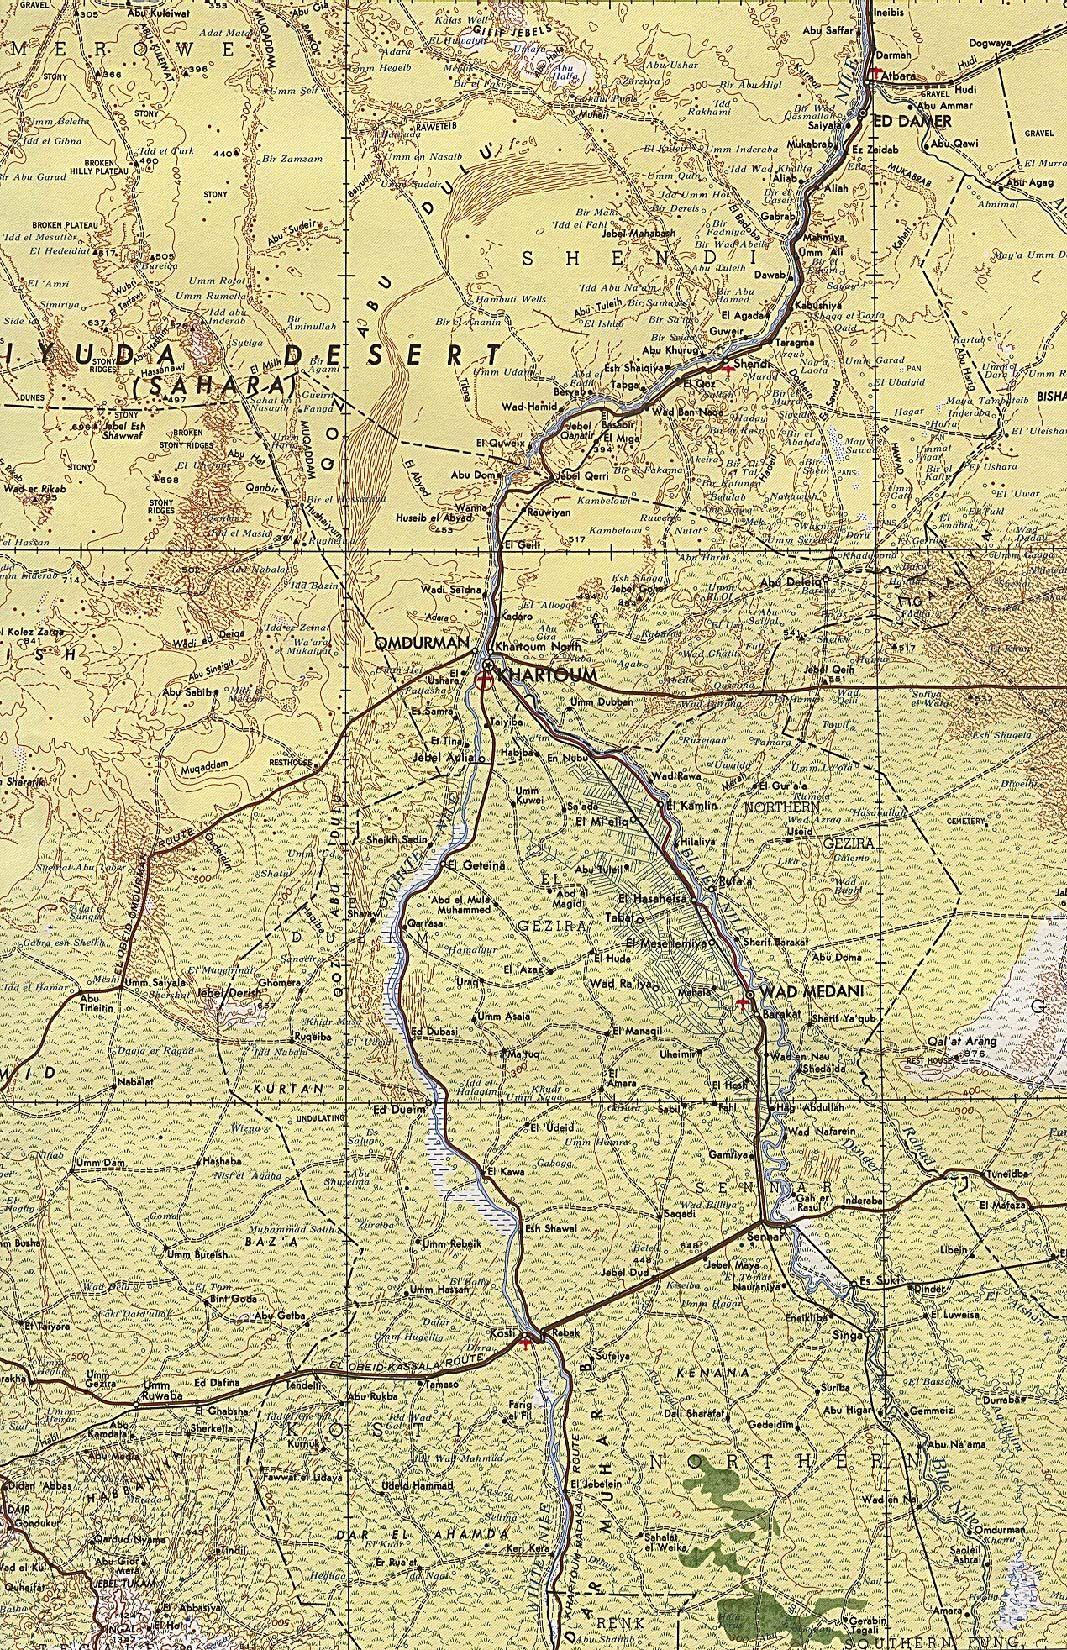 Khartoum Original Scale 1:2,000,000 Portion of U.S. Defense Mapping on accra world map, doha world map, moscow world map, sydney world map, london world map, mumbai world map, mogadishu world map, tokyo world map, paris world map, lagos world map, amman world map, new york world map, nairobi world map, berlin world map, kinshasa world map, victoria world map, shanghai world map, constantinople world map, stockholm world map, ankara world map,